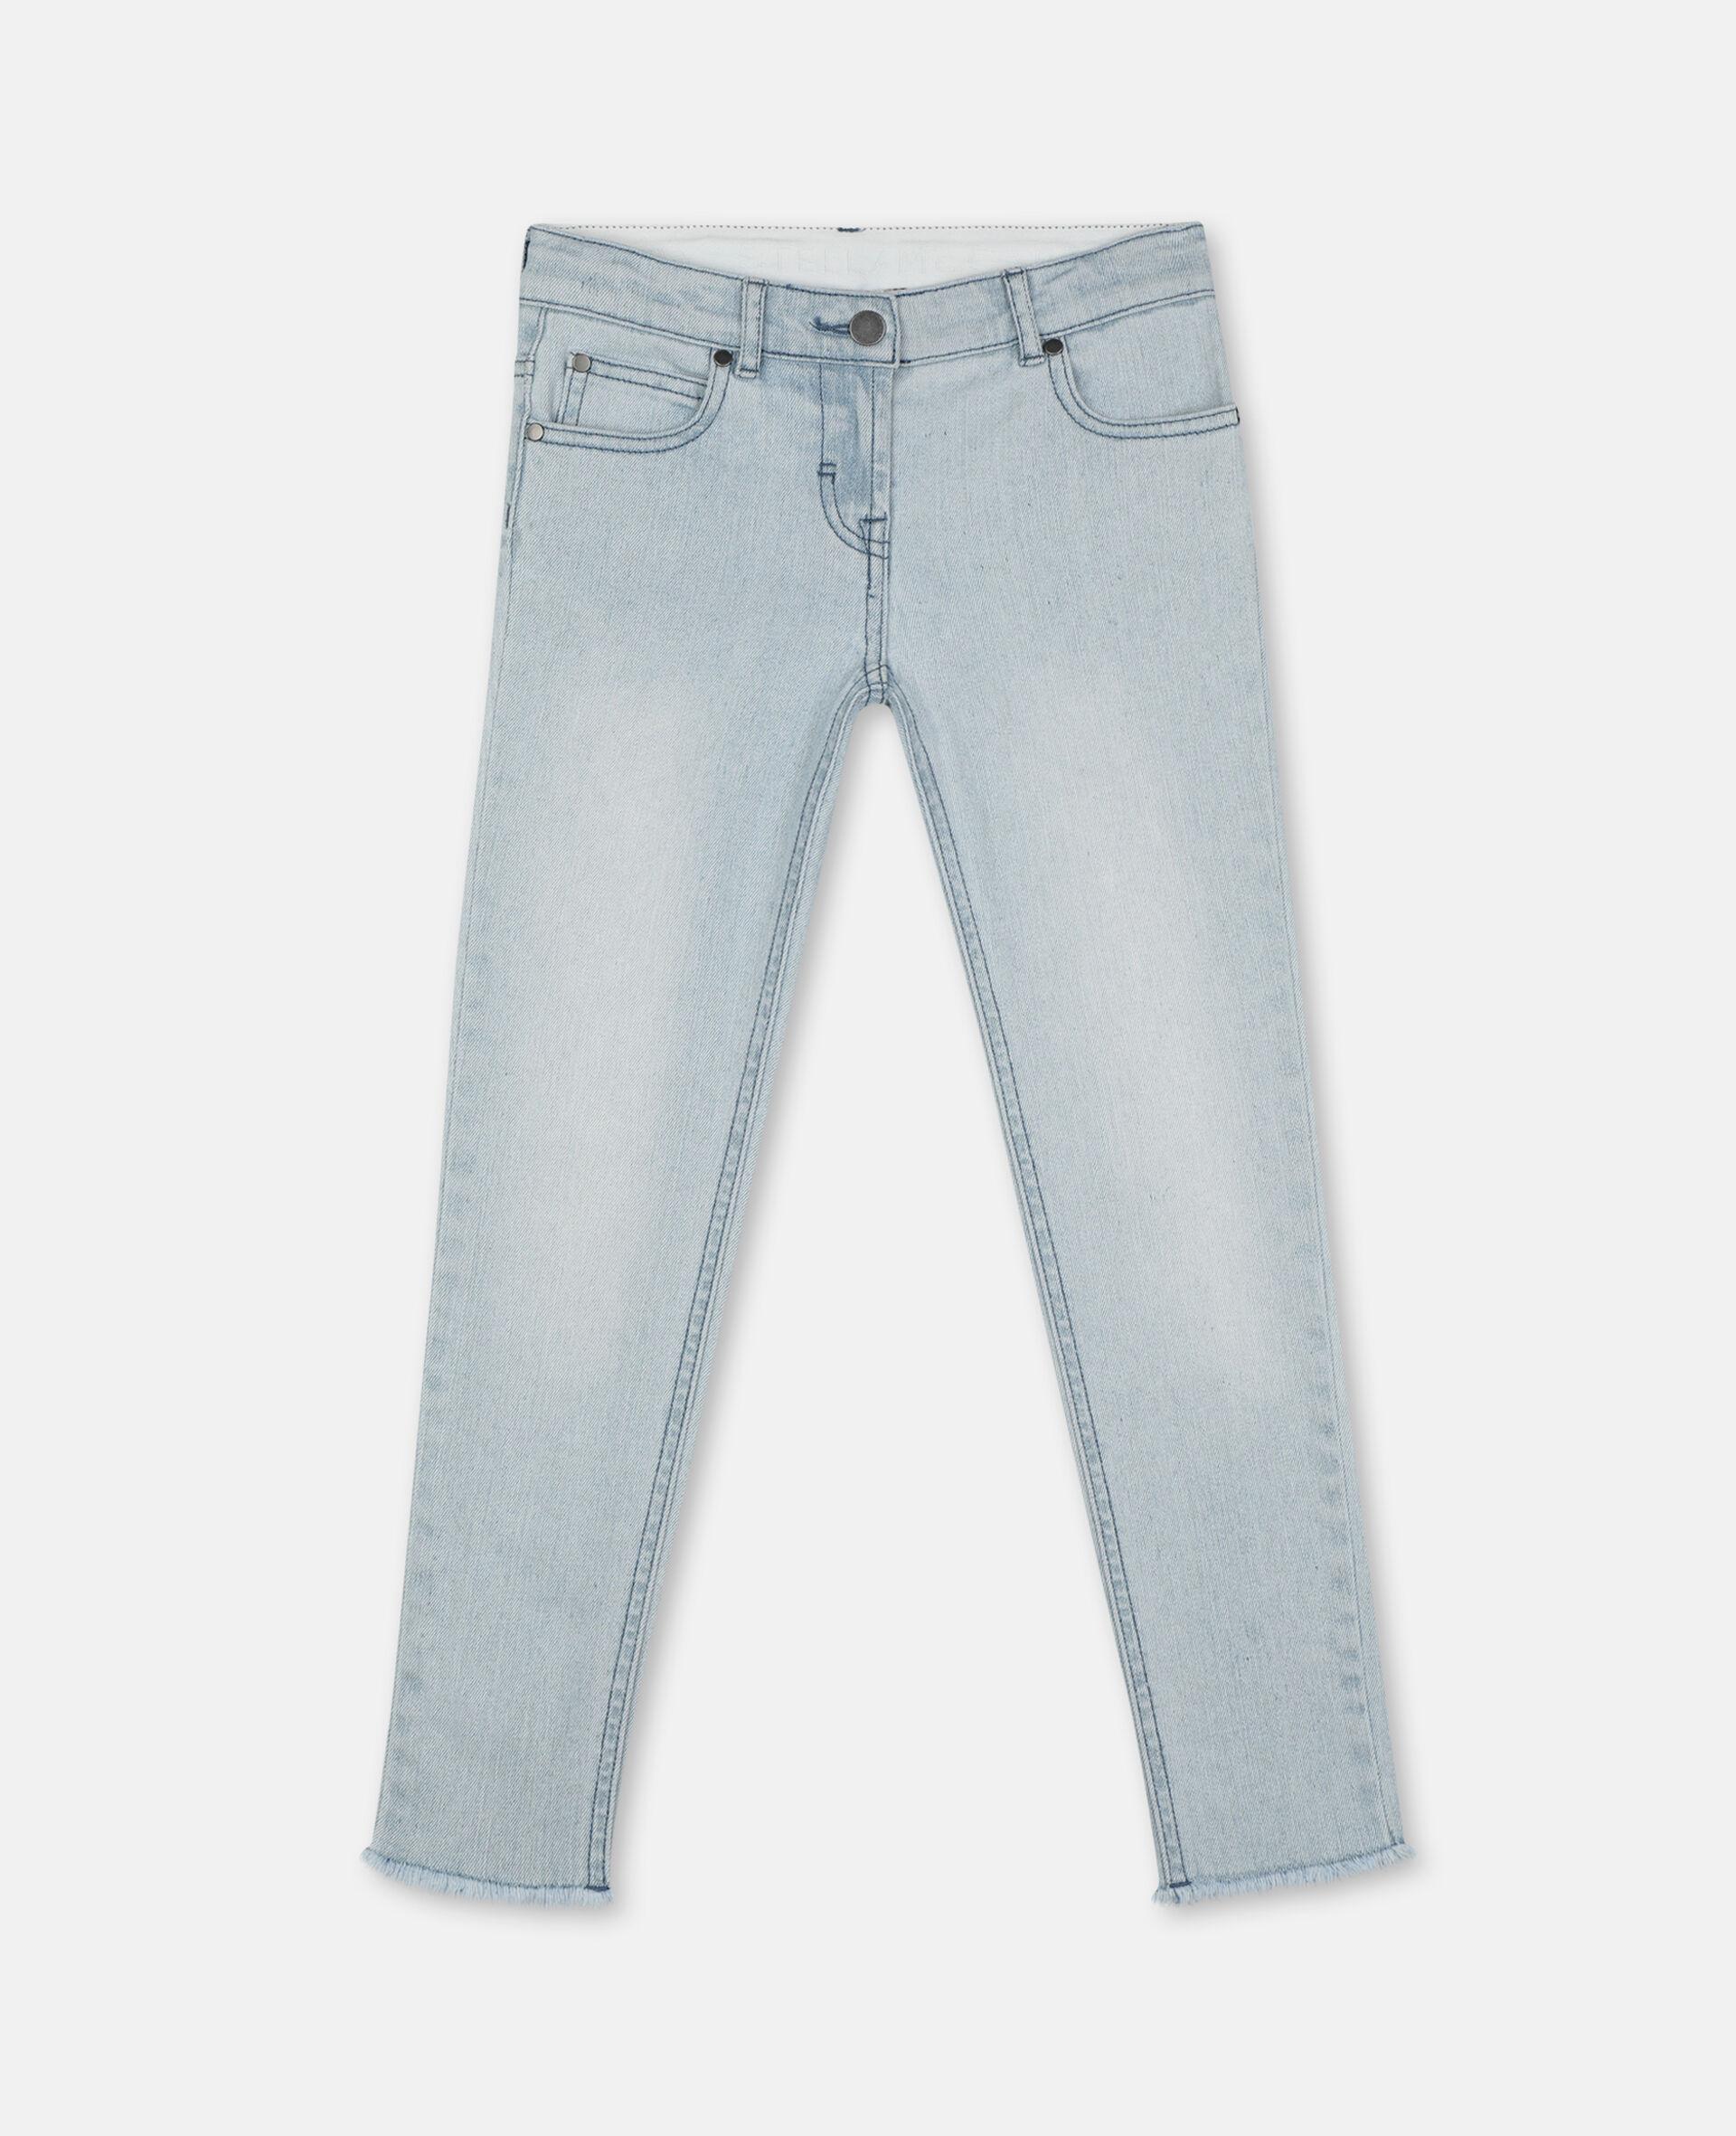 Skinny Denim Trousers-Blue-large image number 0